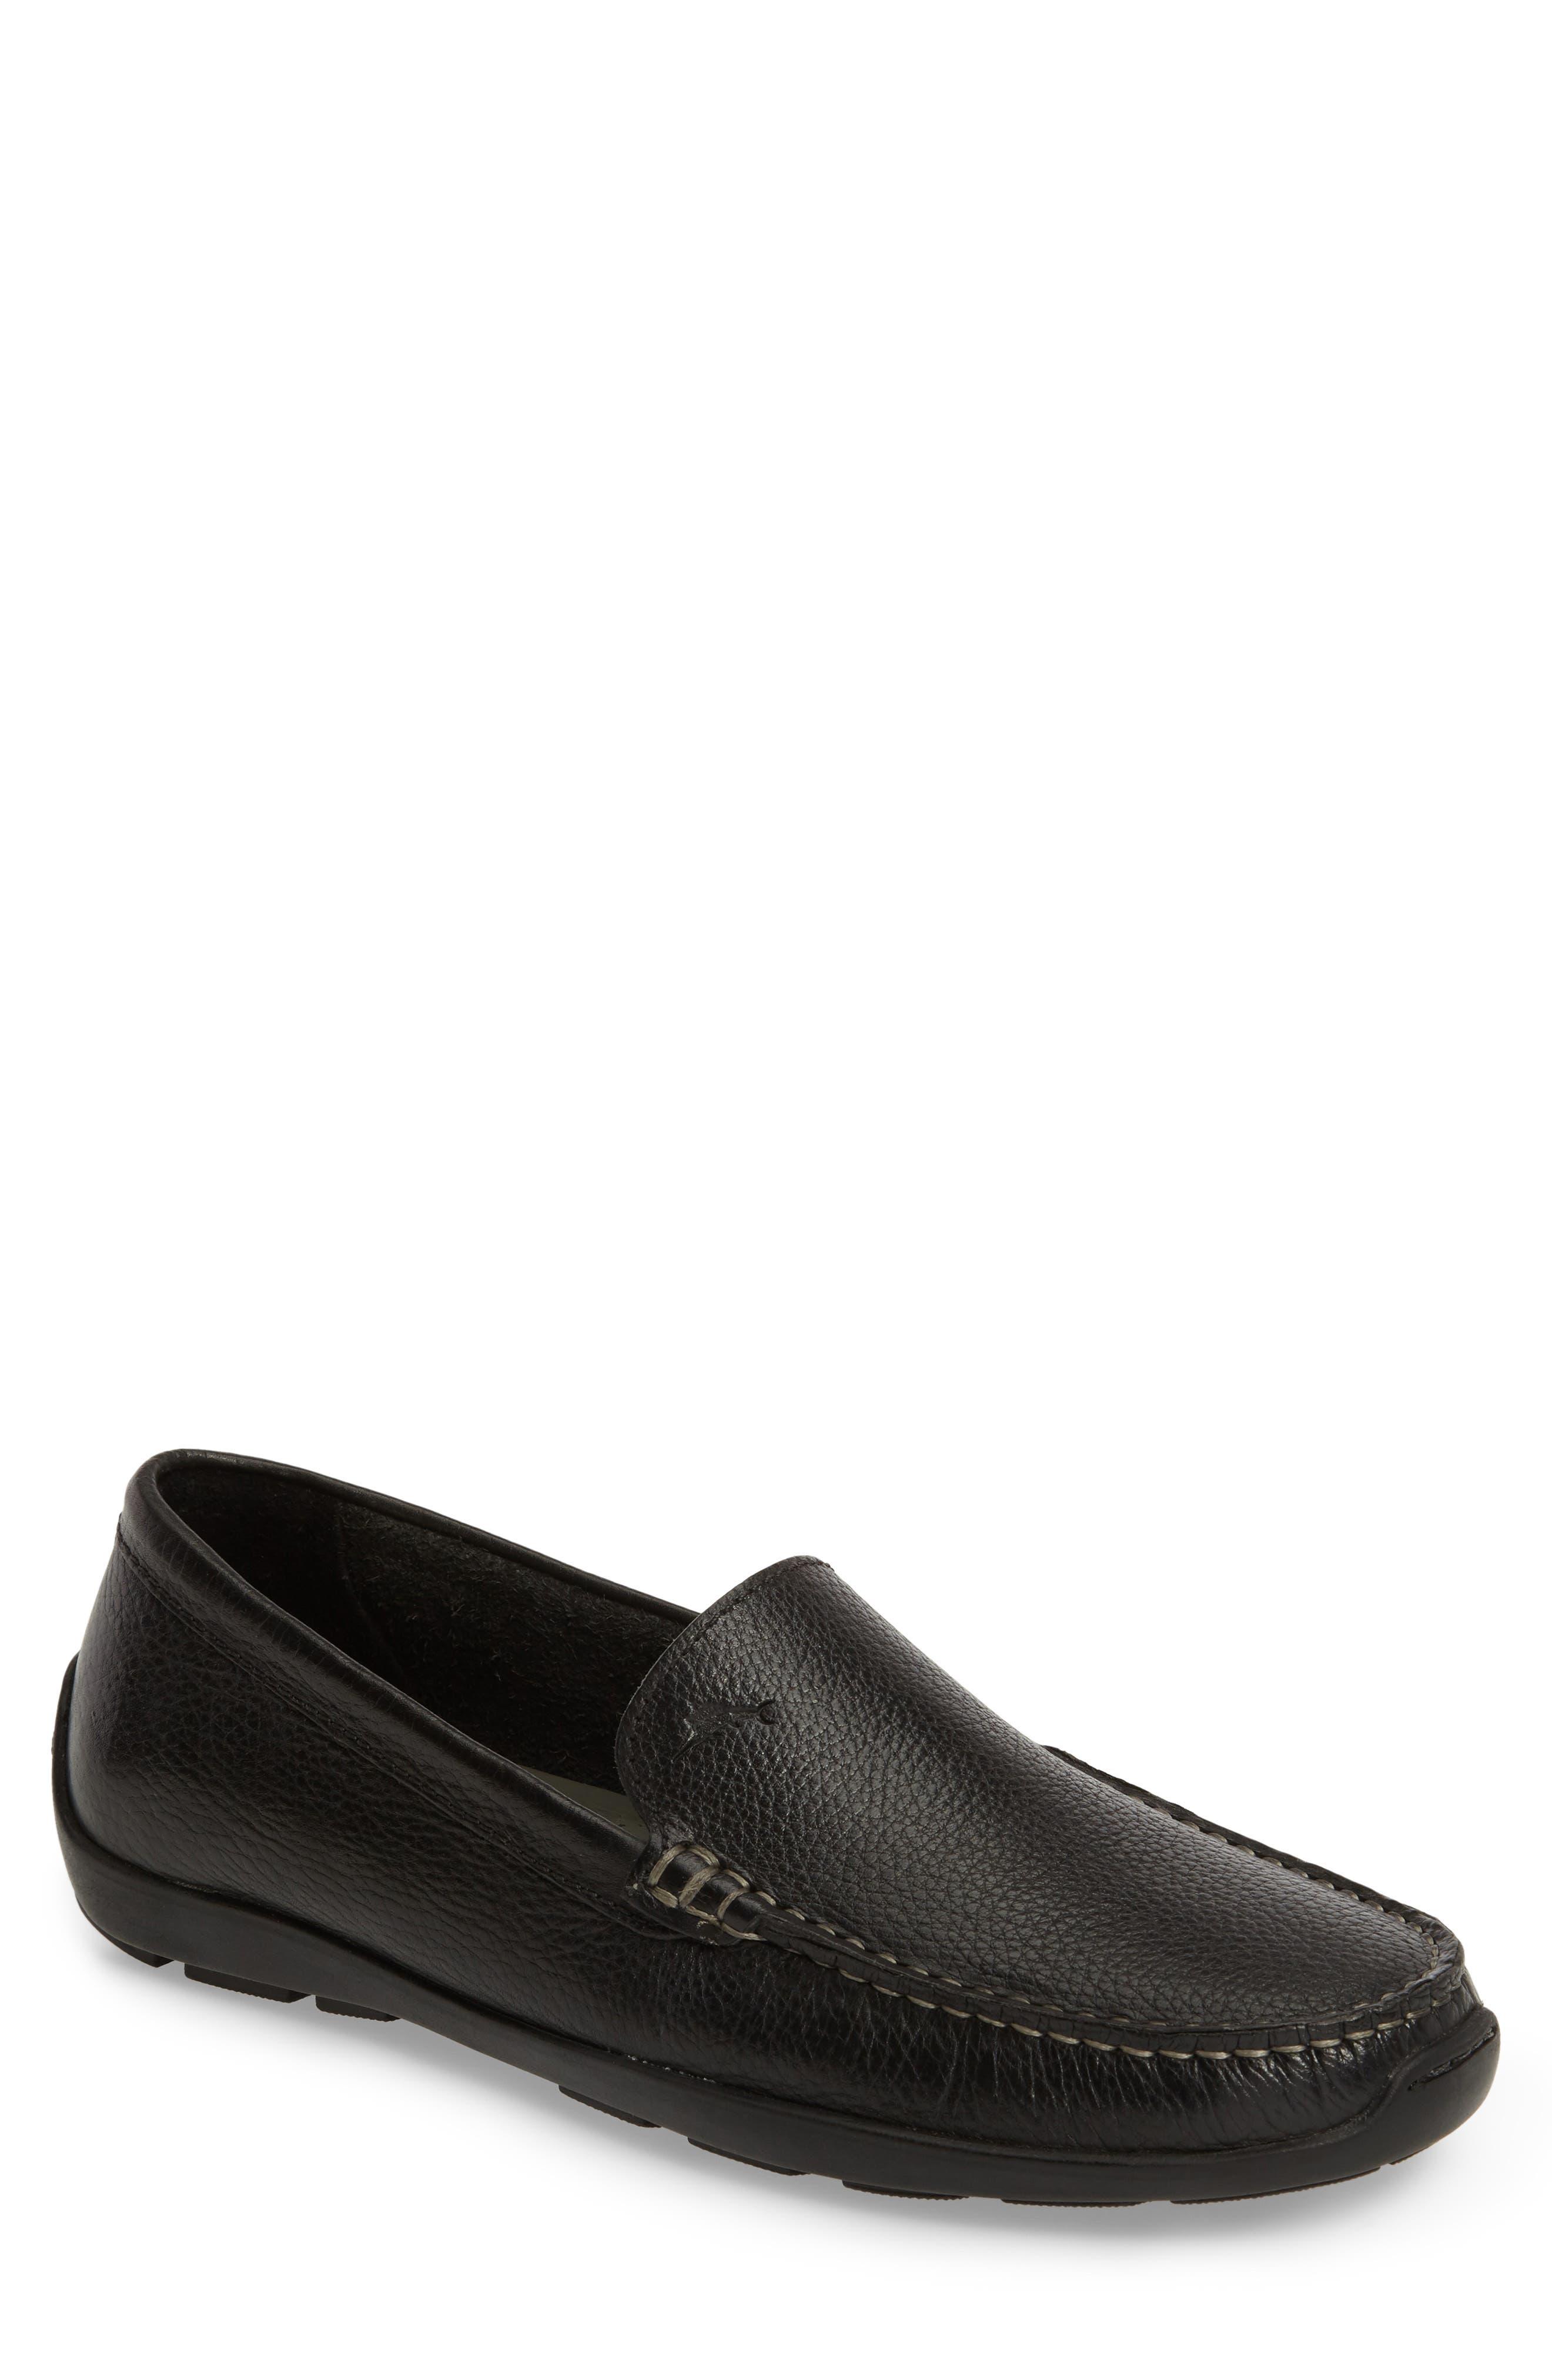 Orion Venetian Loafer,                         Main,                         color, Black Leather